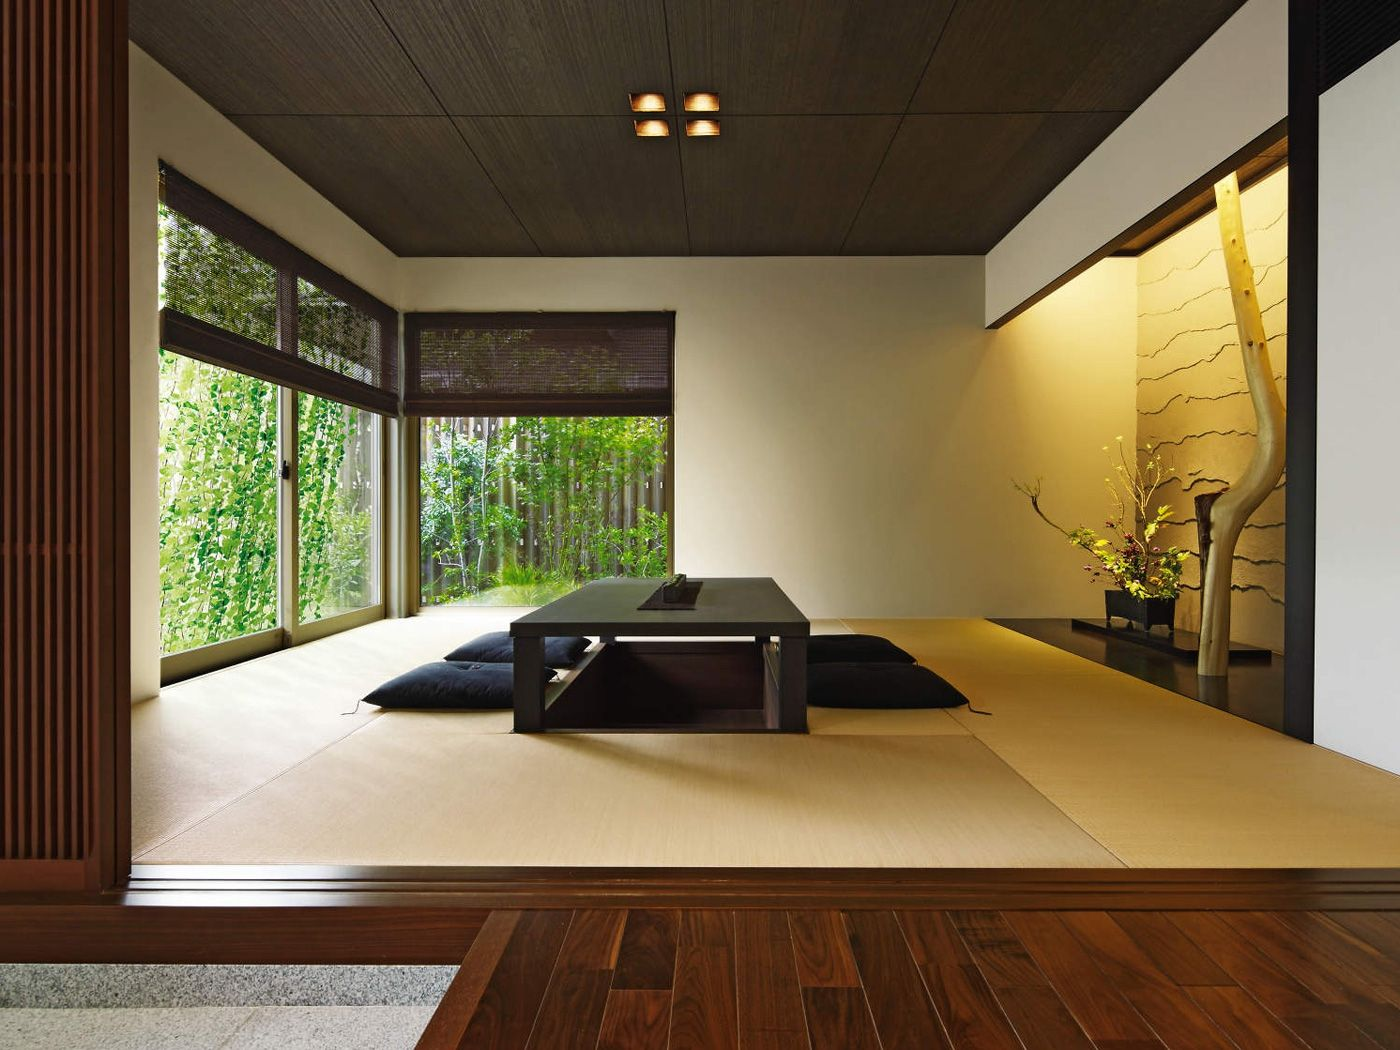 japanische h user diele haus. Black Bedroom Furniture Sets. Home Design Ideas